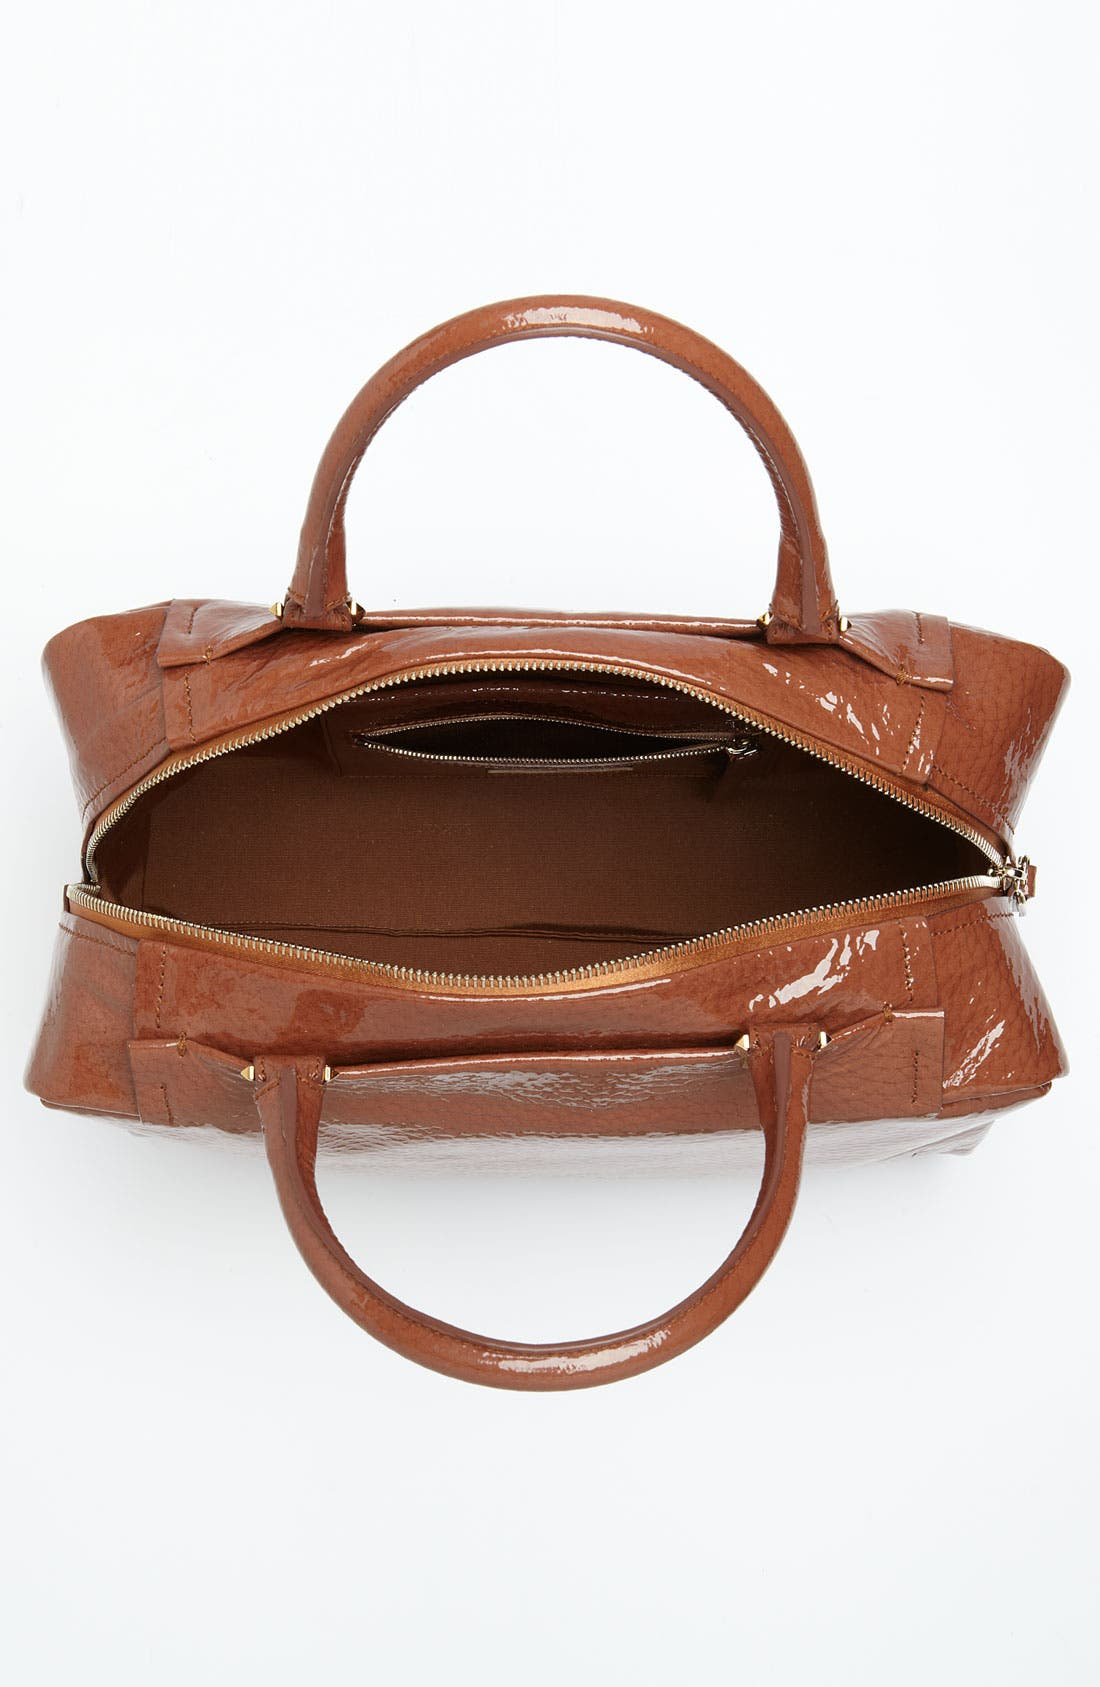 Alternate Image 3  - Lanvin 'Moon River' Patent Leather Satchel